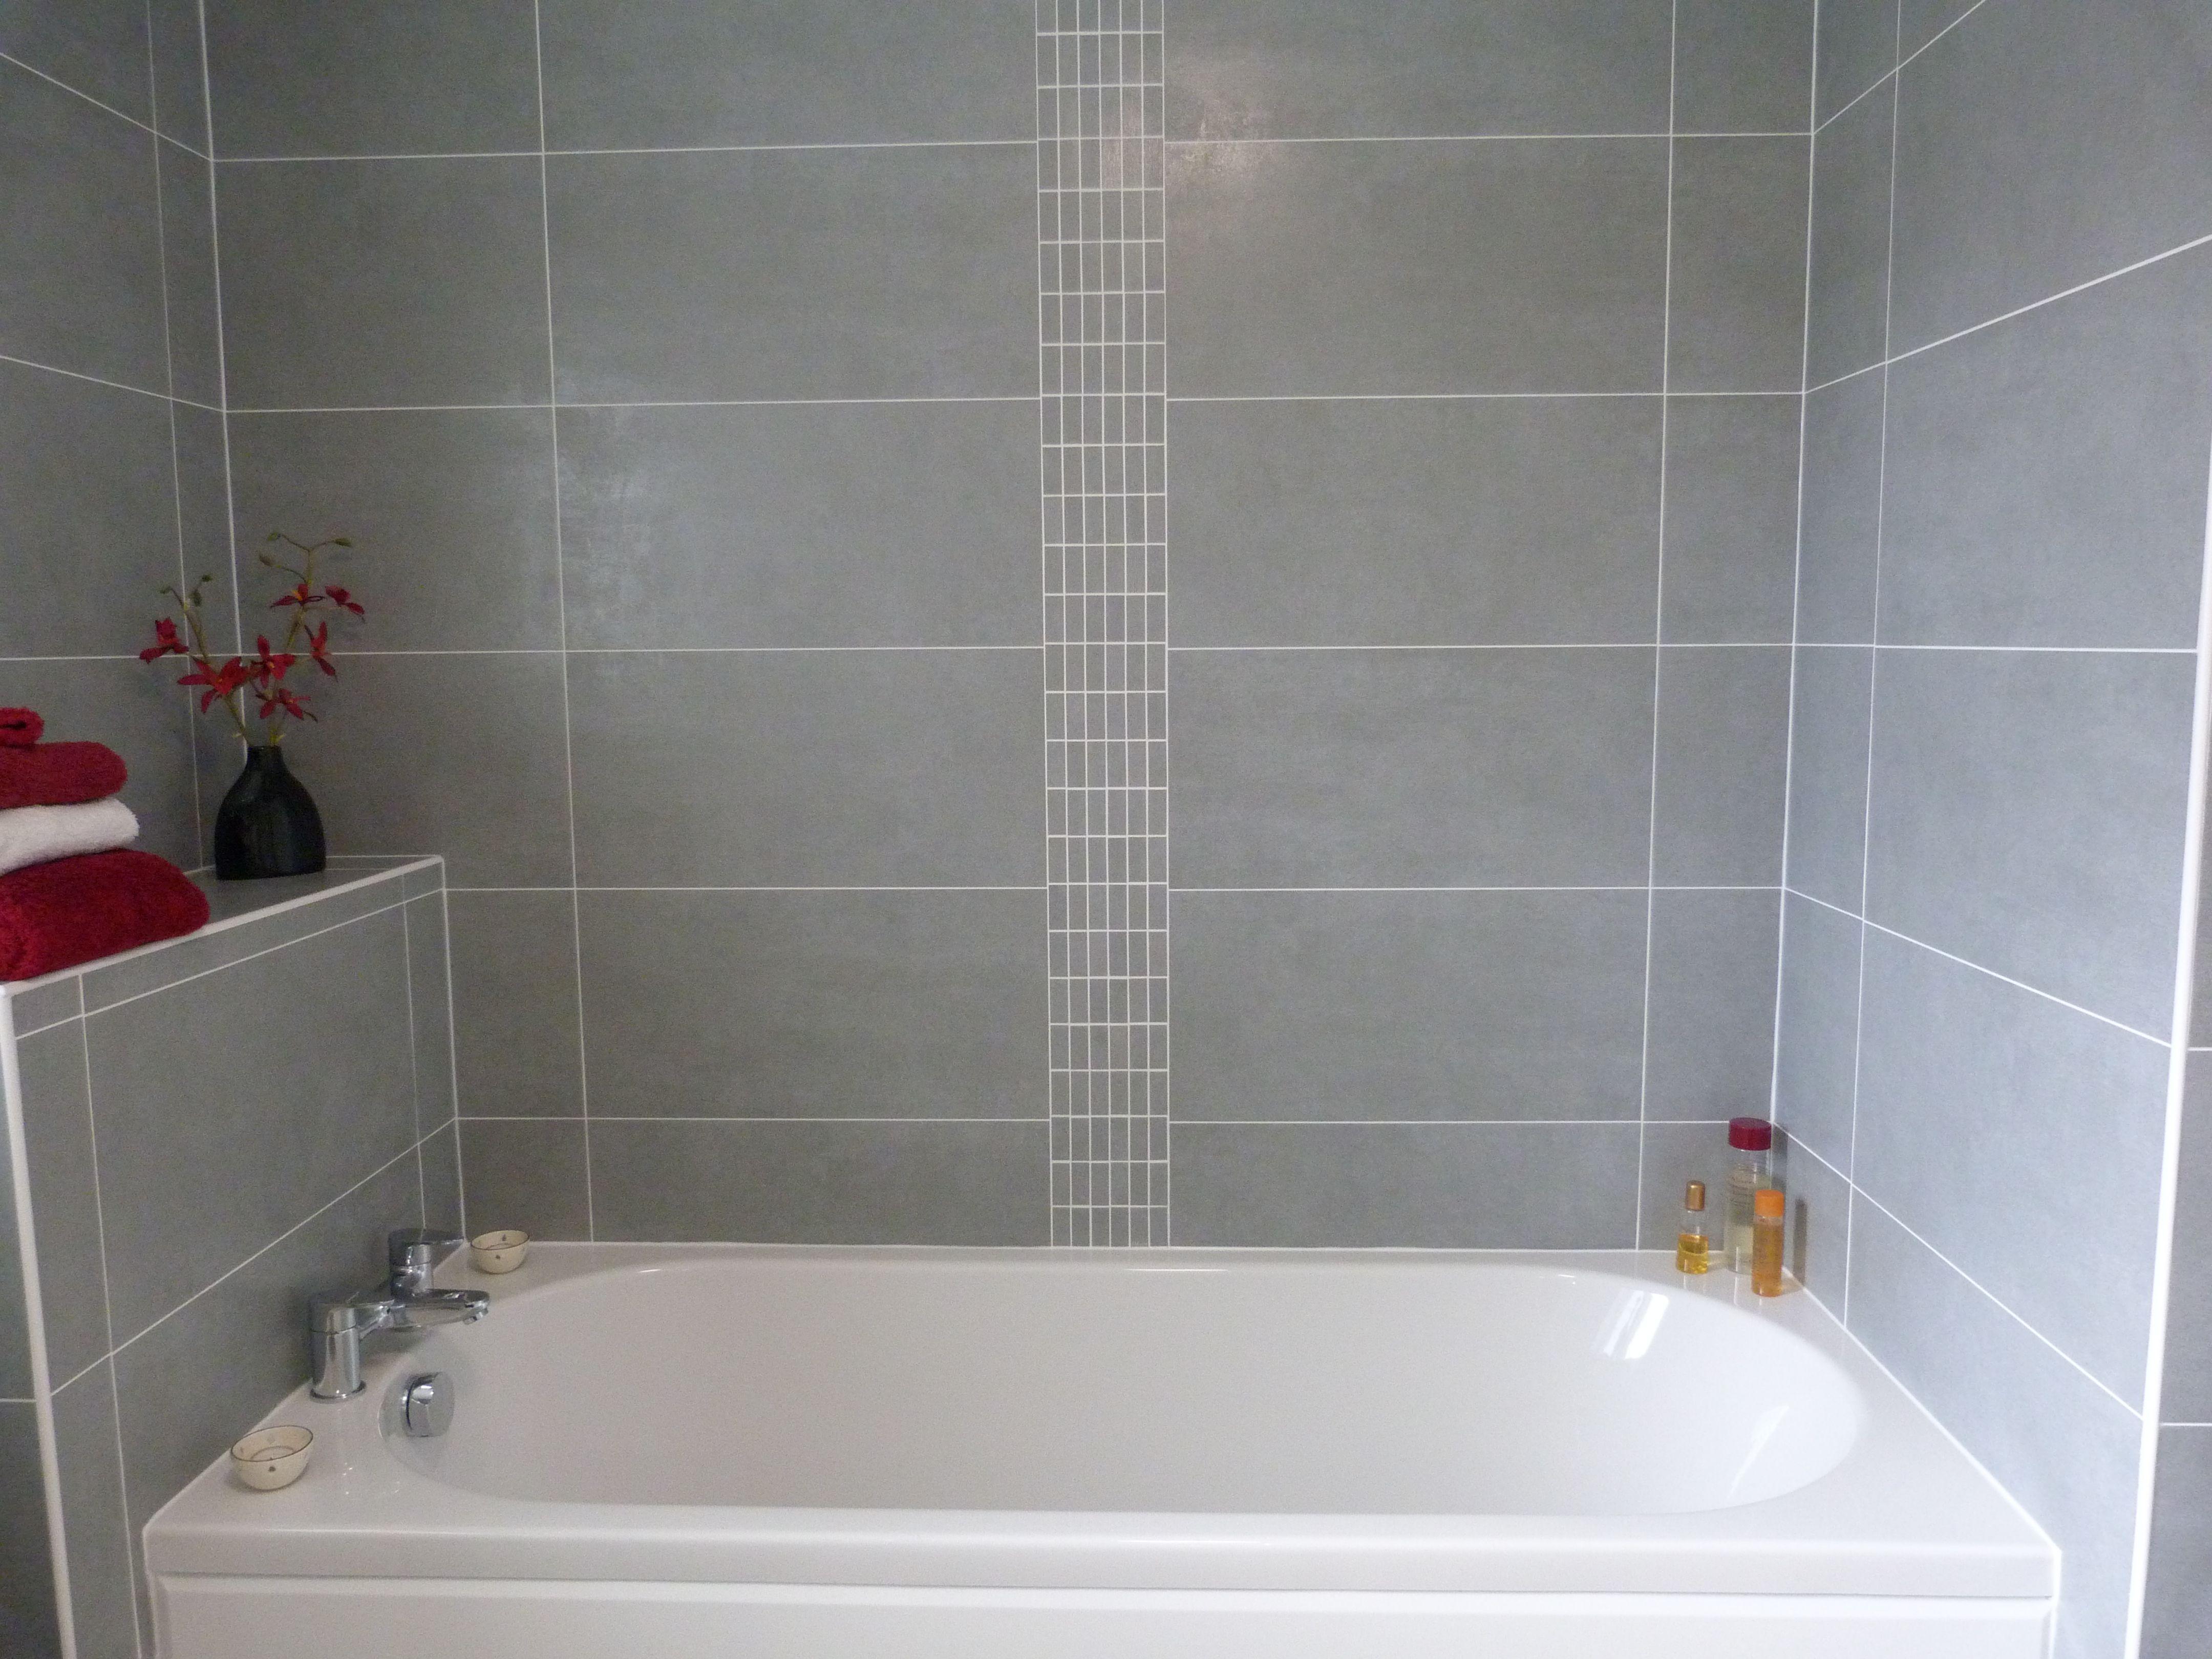 Bathroom Vanity 600 X 300 en-suite refurbishment recently completed. a shower enclosure